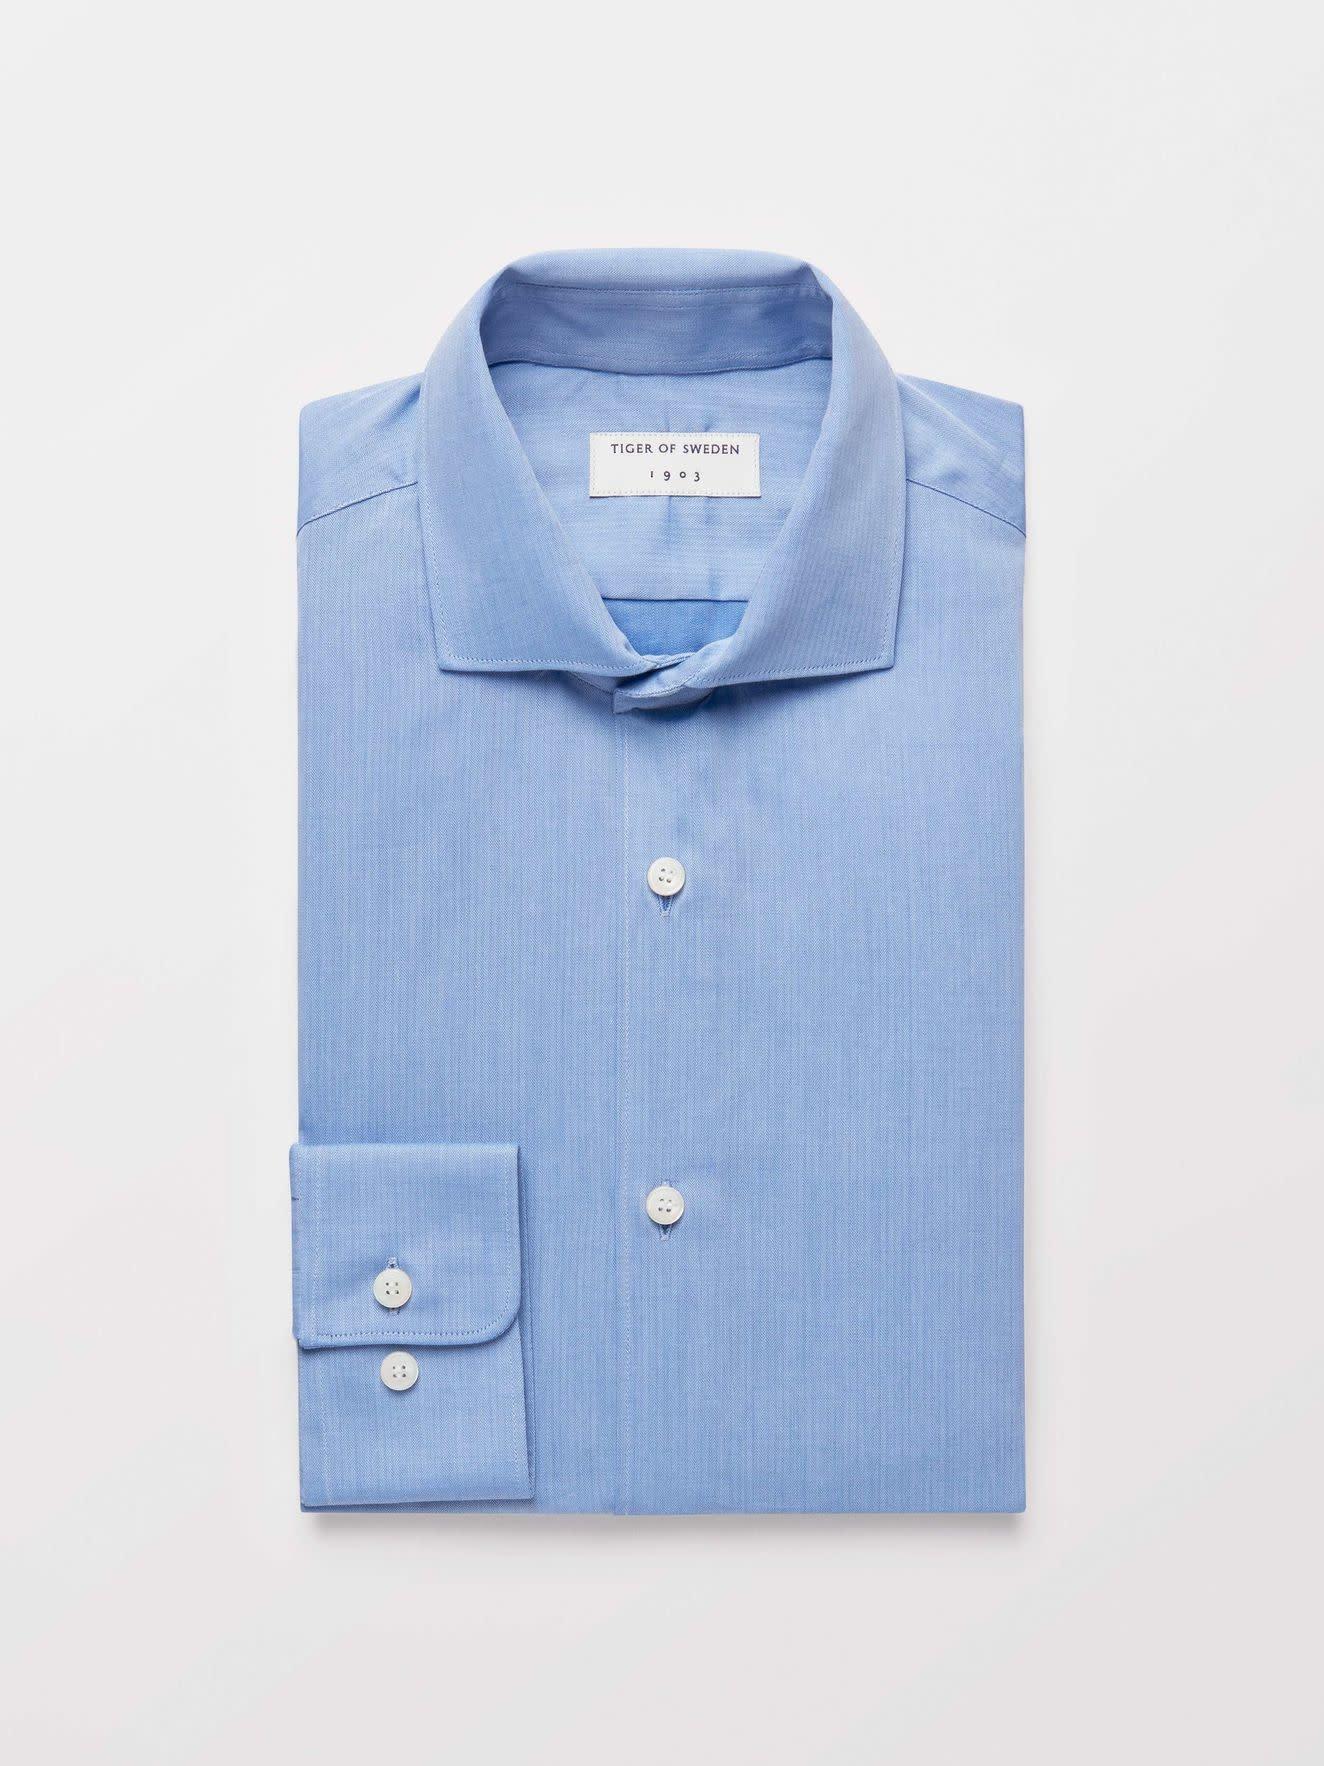 Farrell 5 net gekleed overhemd lichtblauw-2